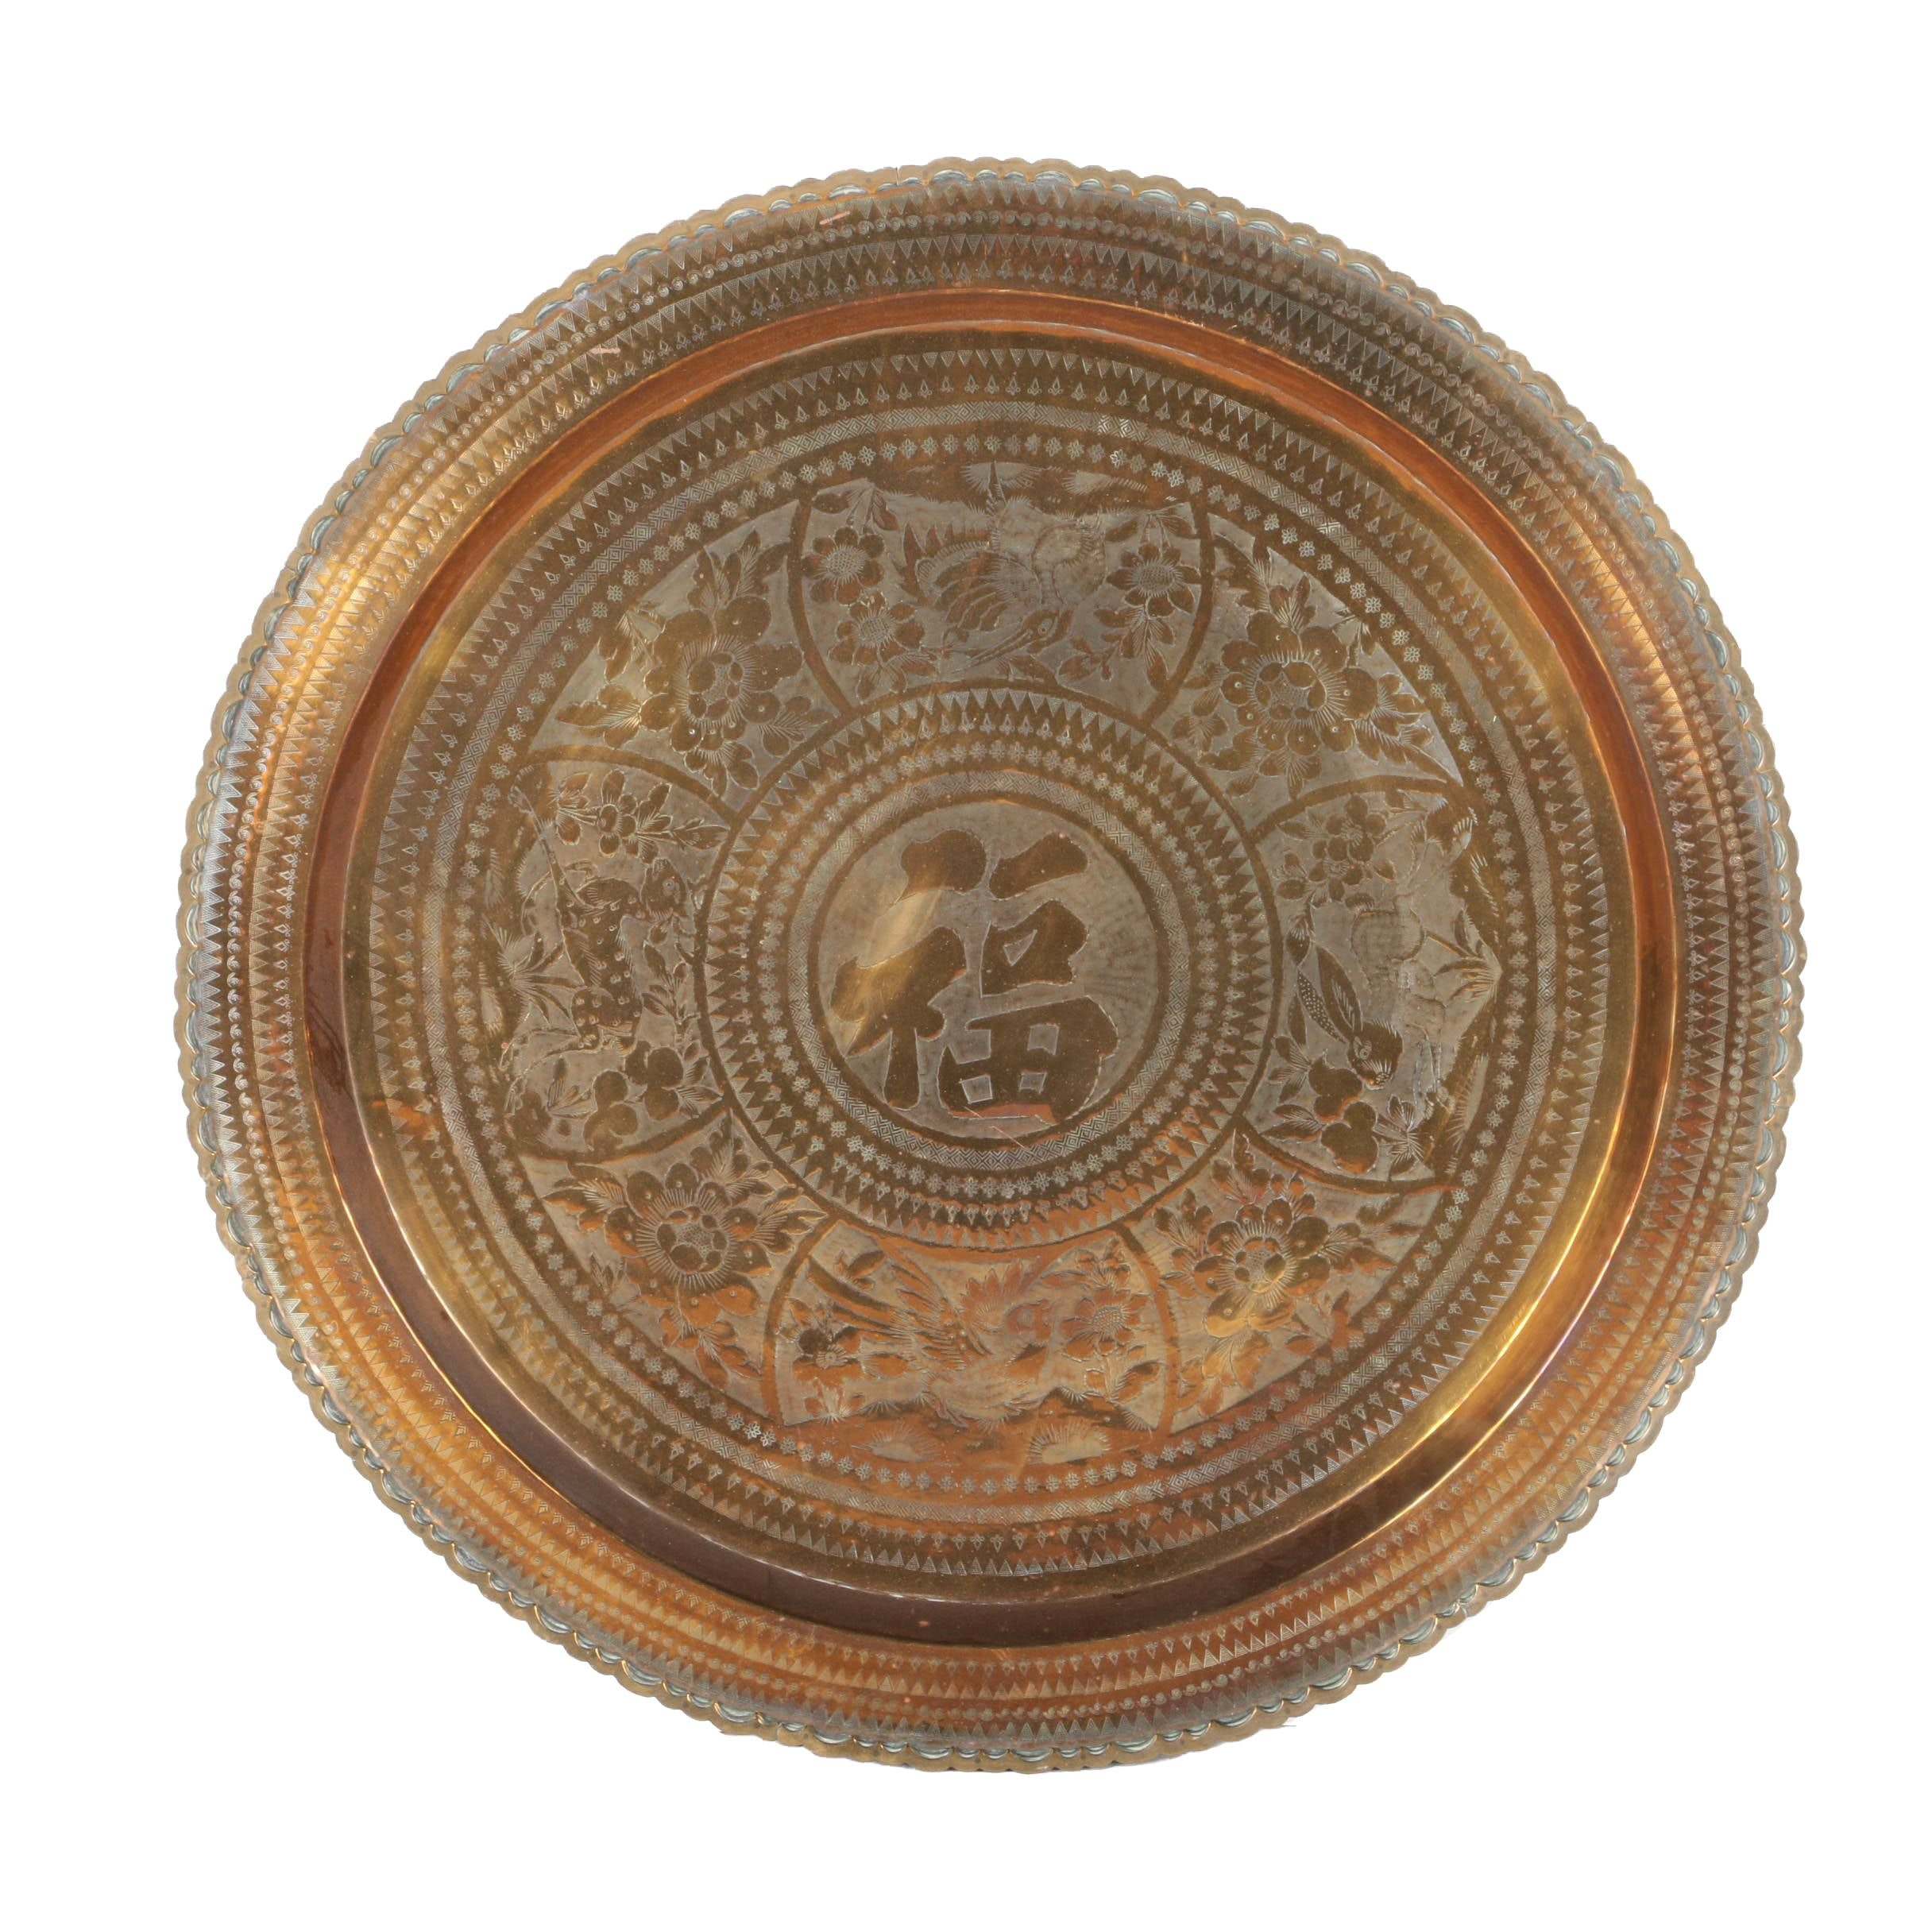 Asian Style Decorative Metal Plate ...  sc 1 st  EBTH.com & Asian Style Decorative Metal Plate : EBTH